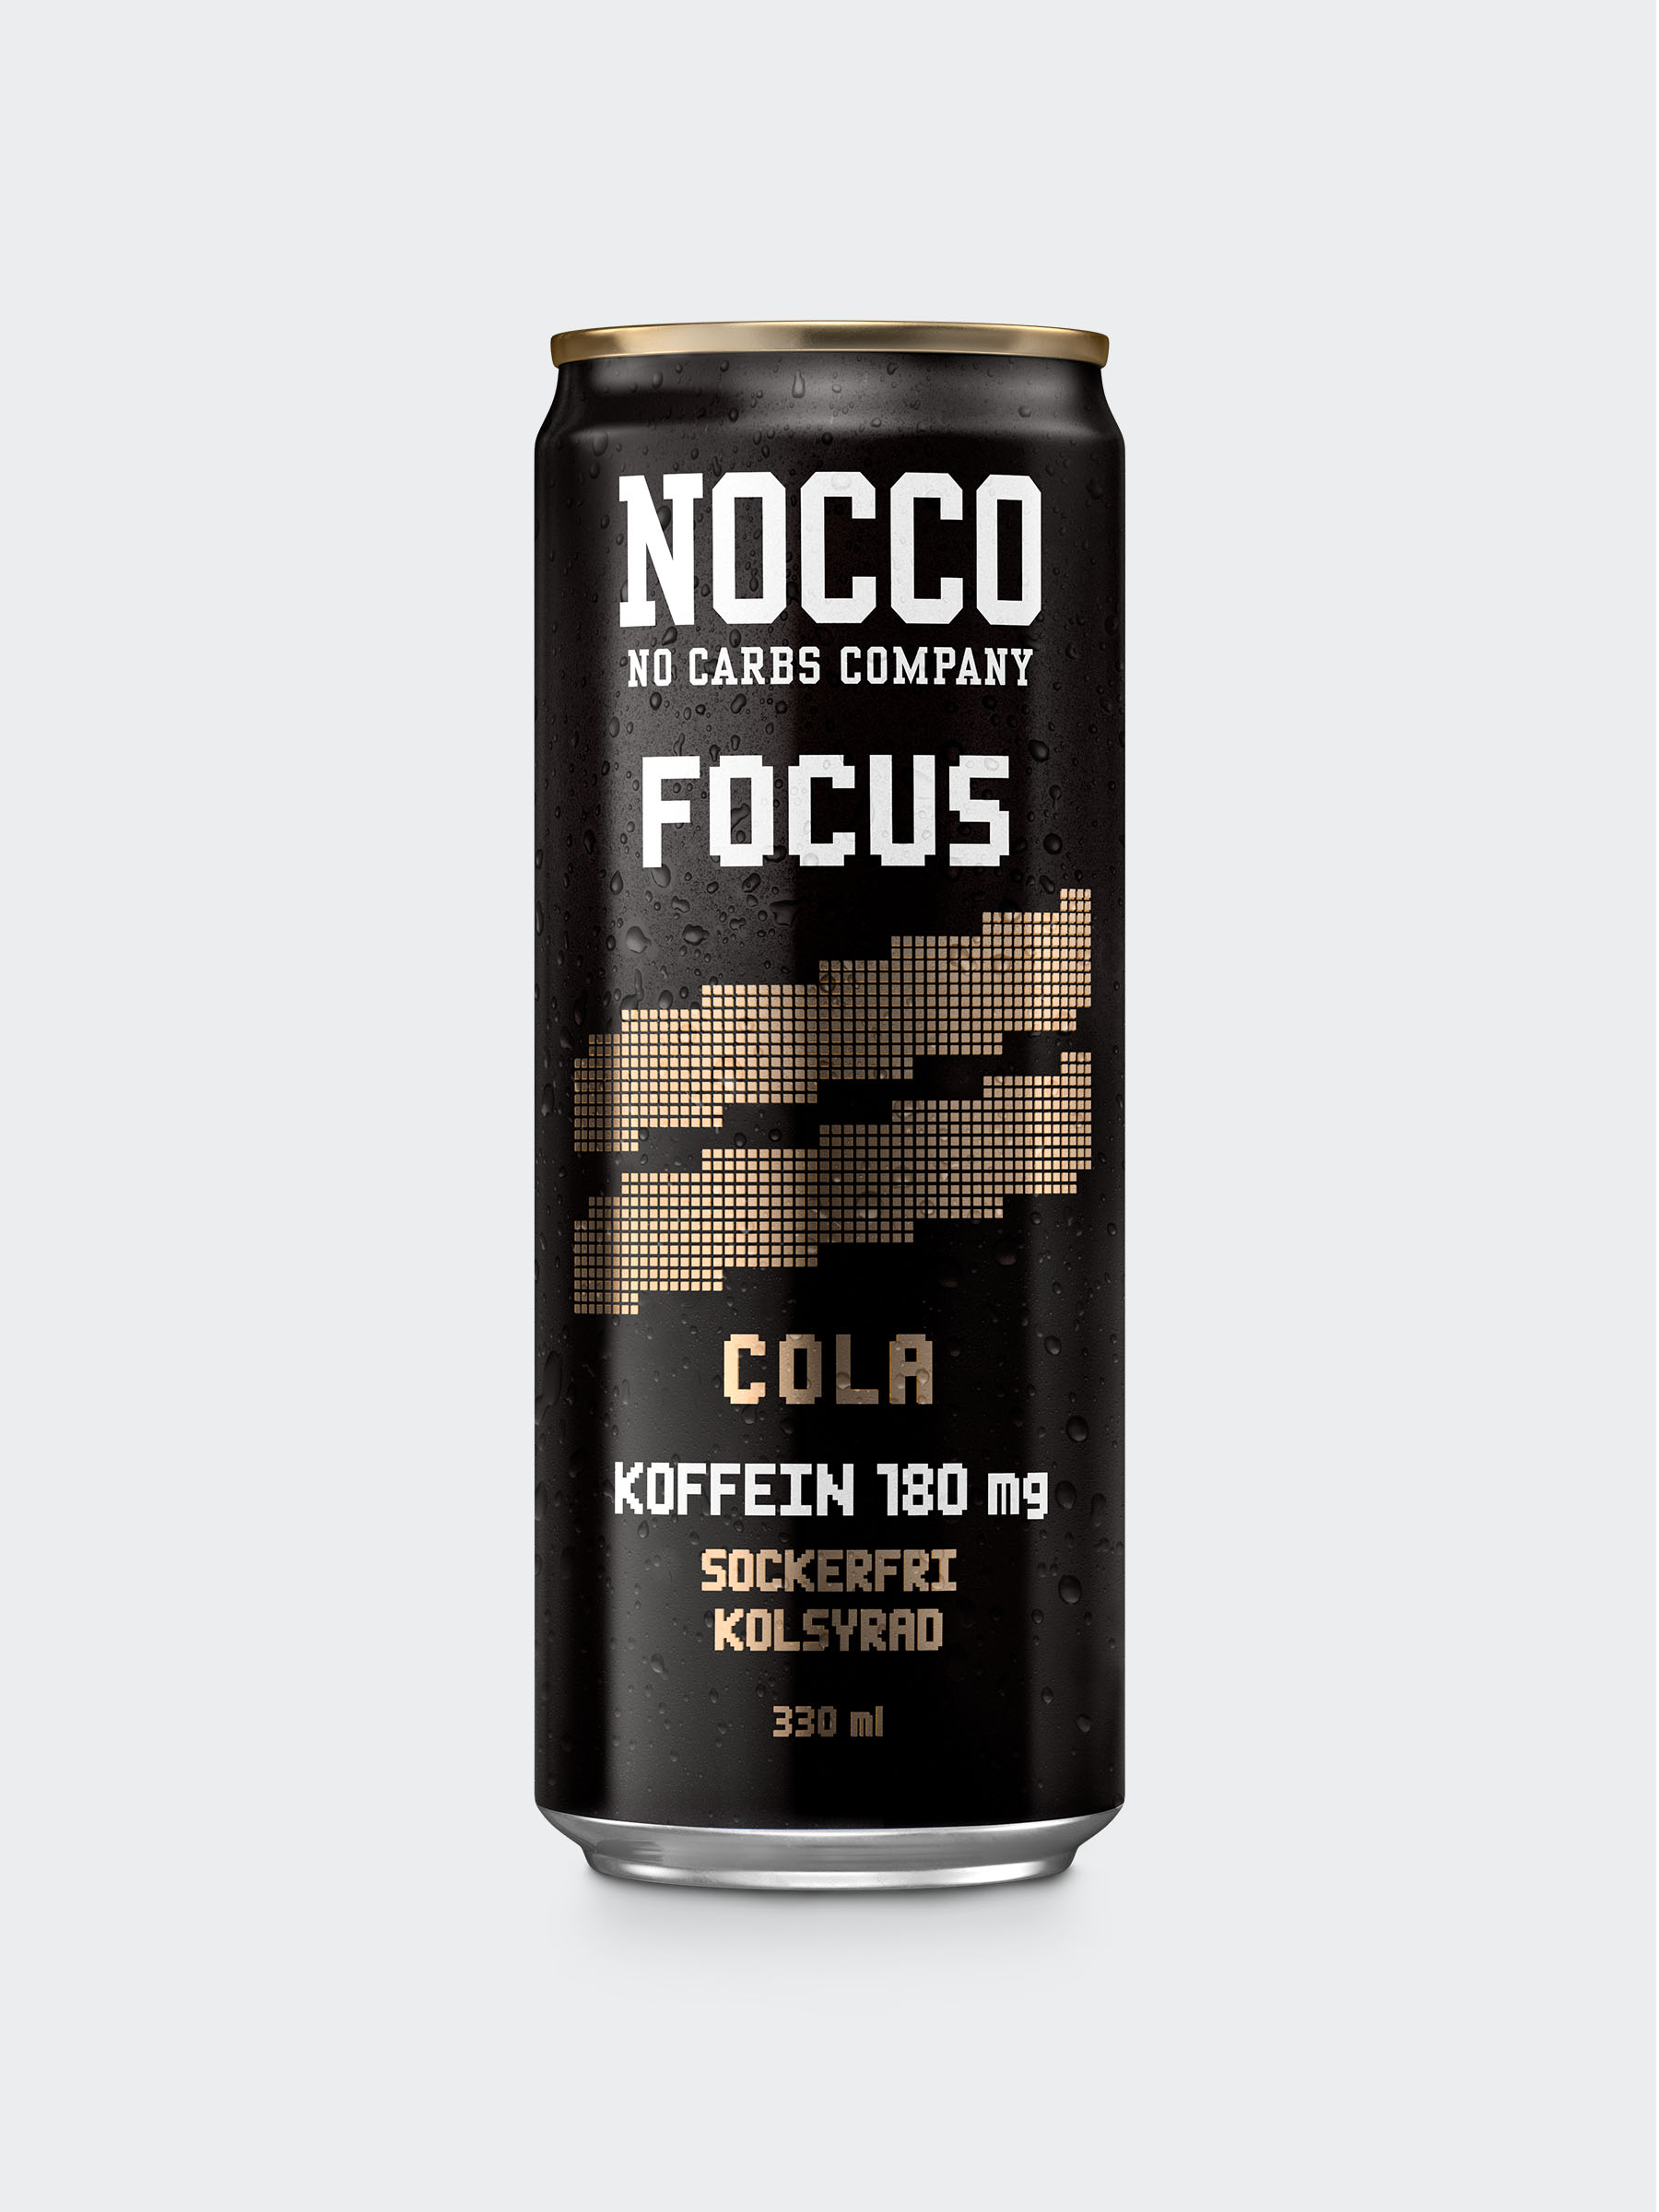 NOCCO FOCUS Cola